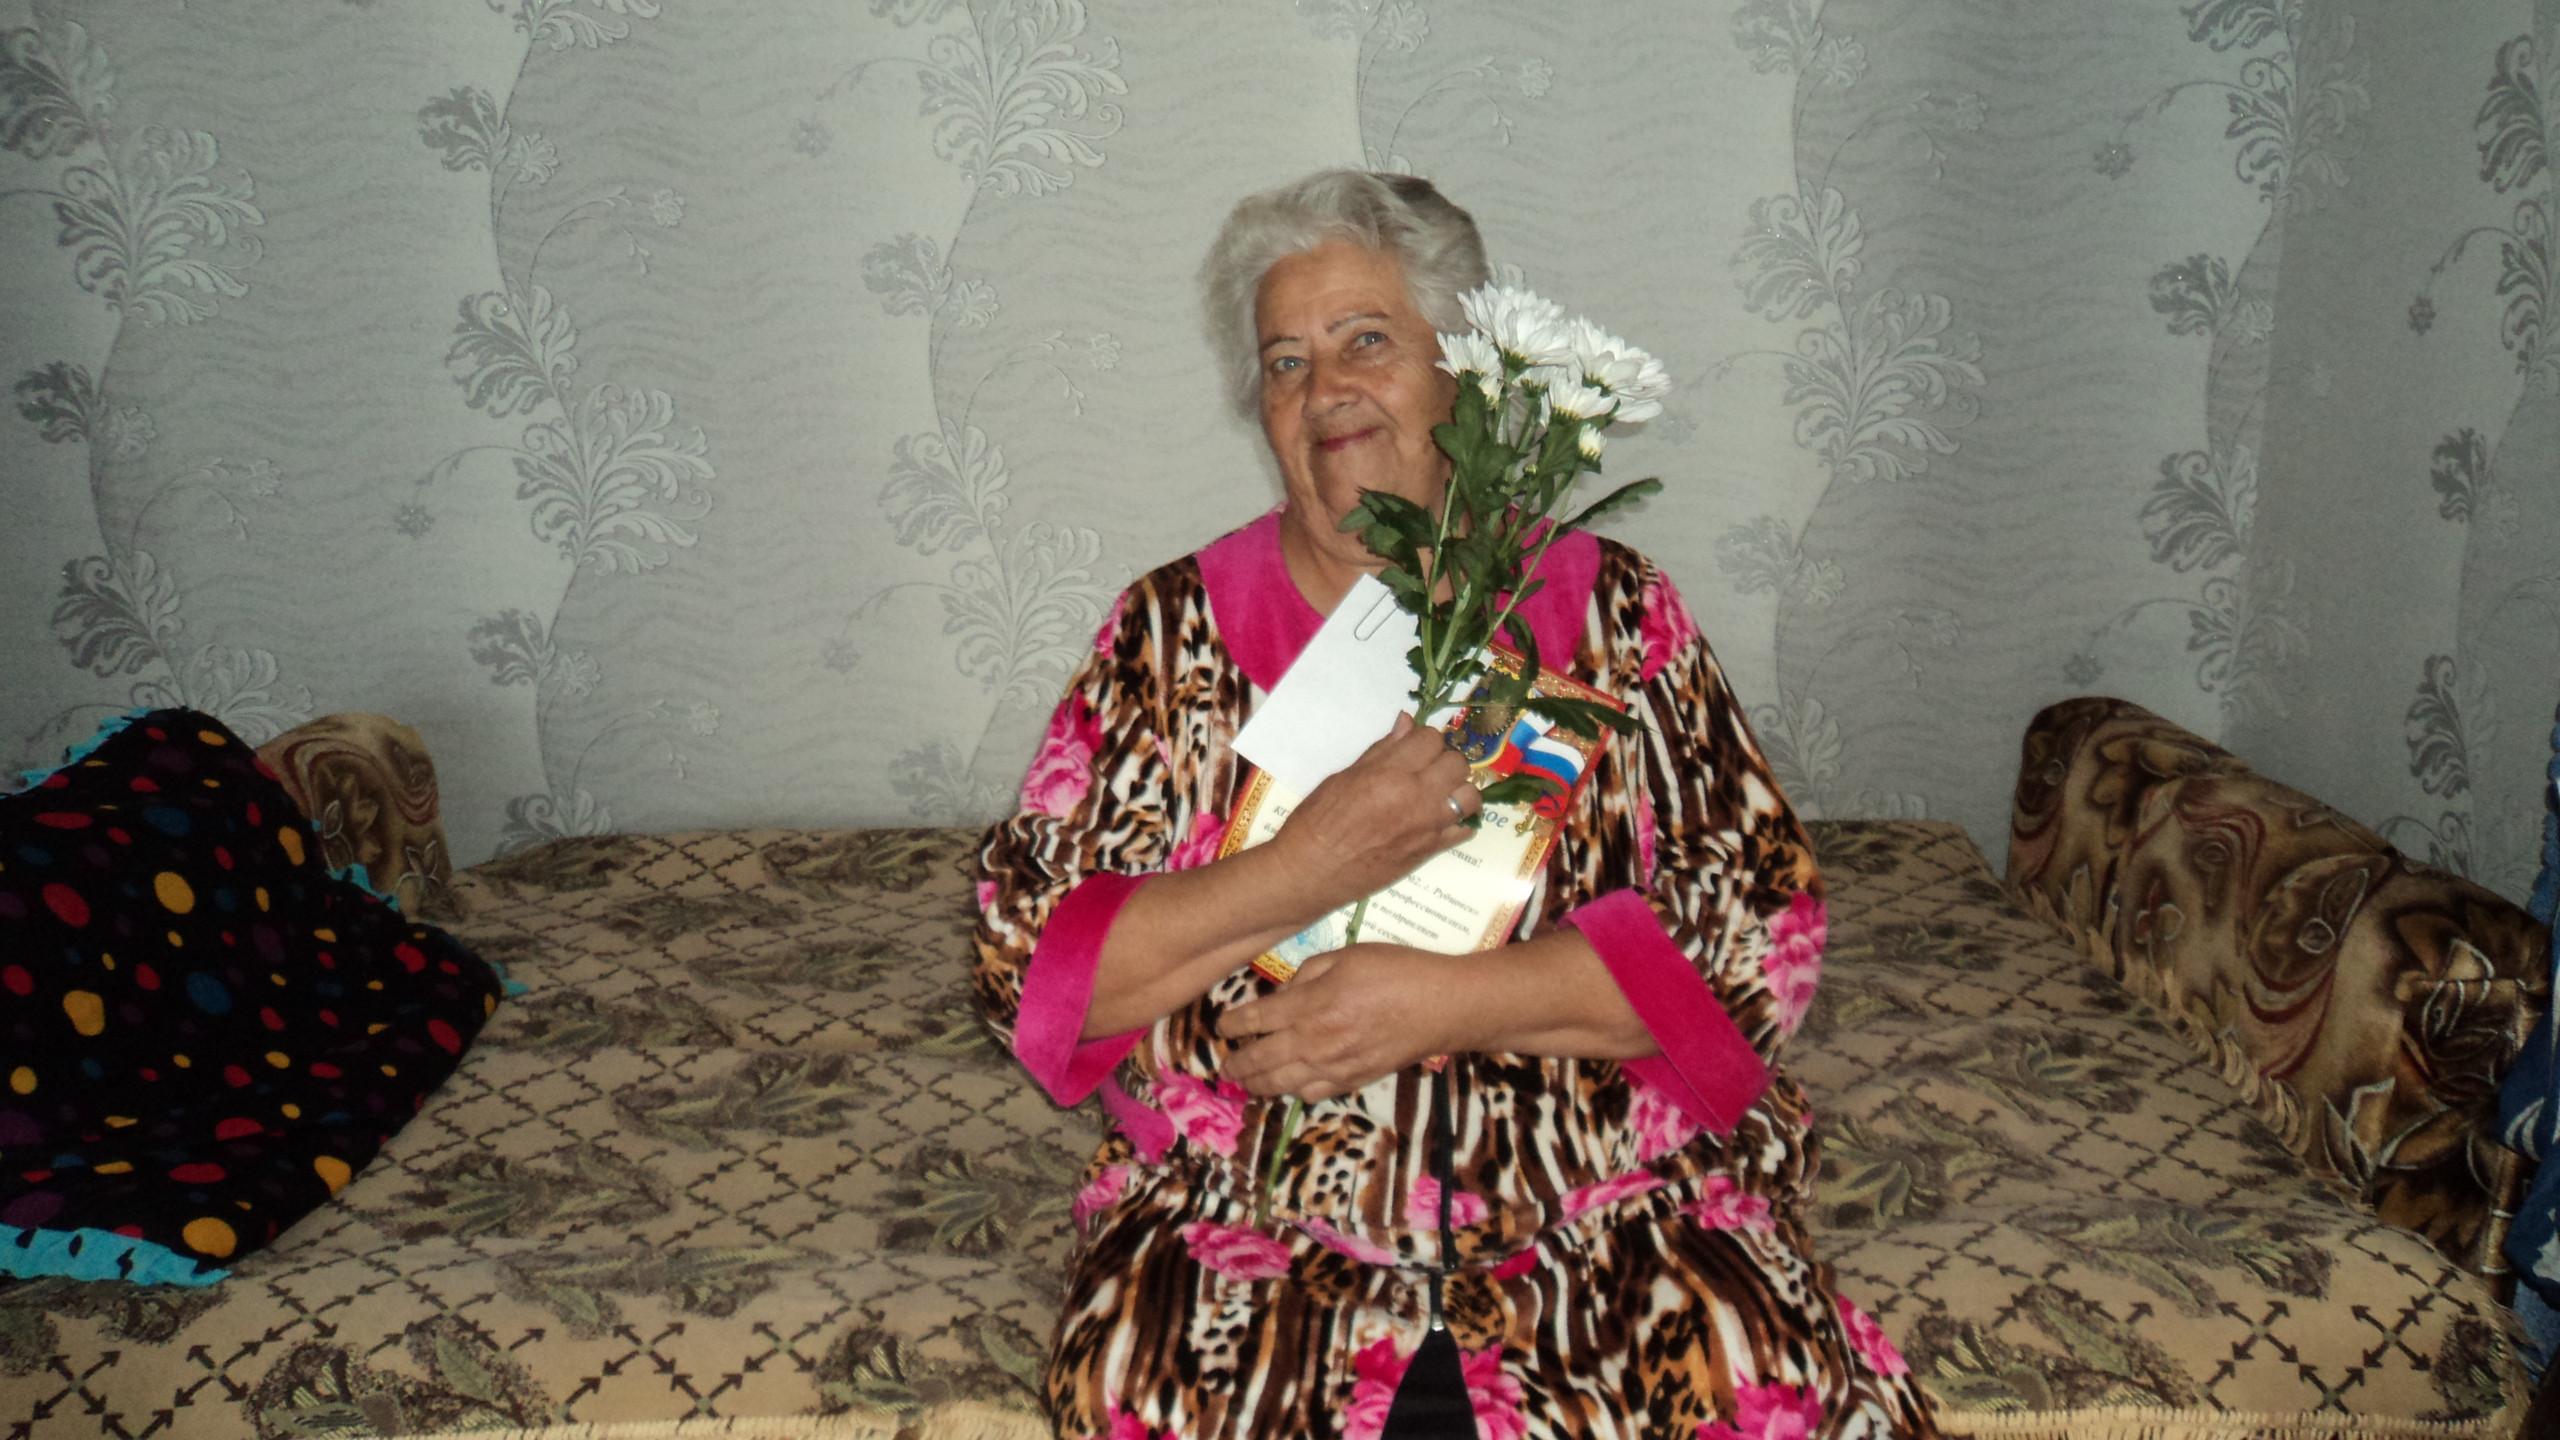 Кухарь Галина Андреевна